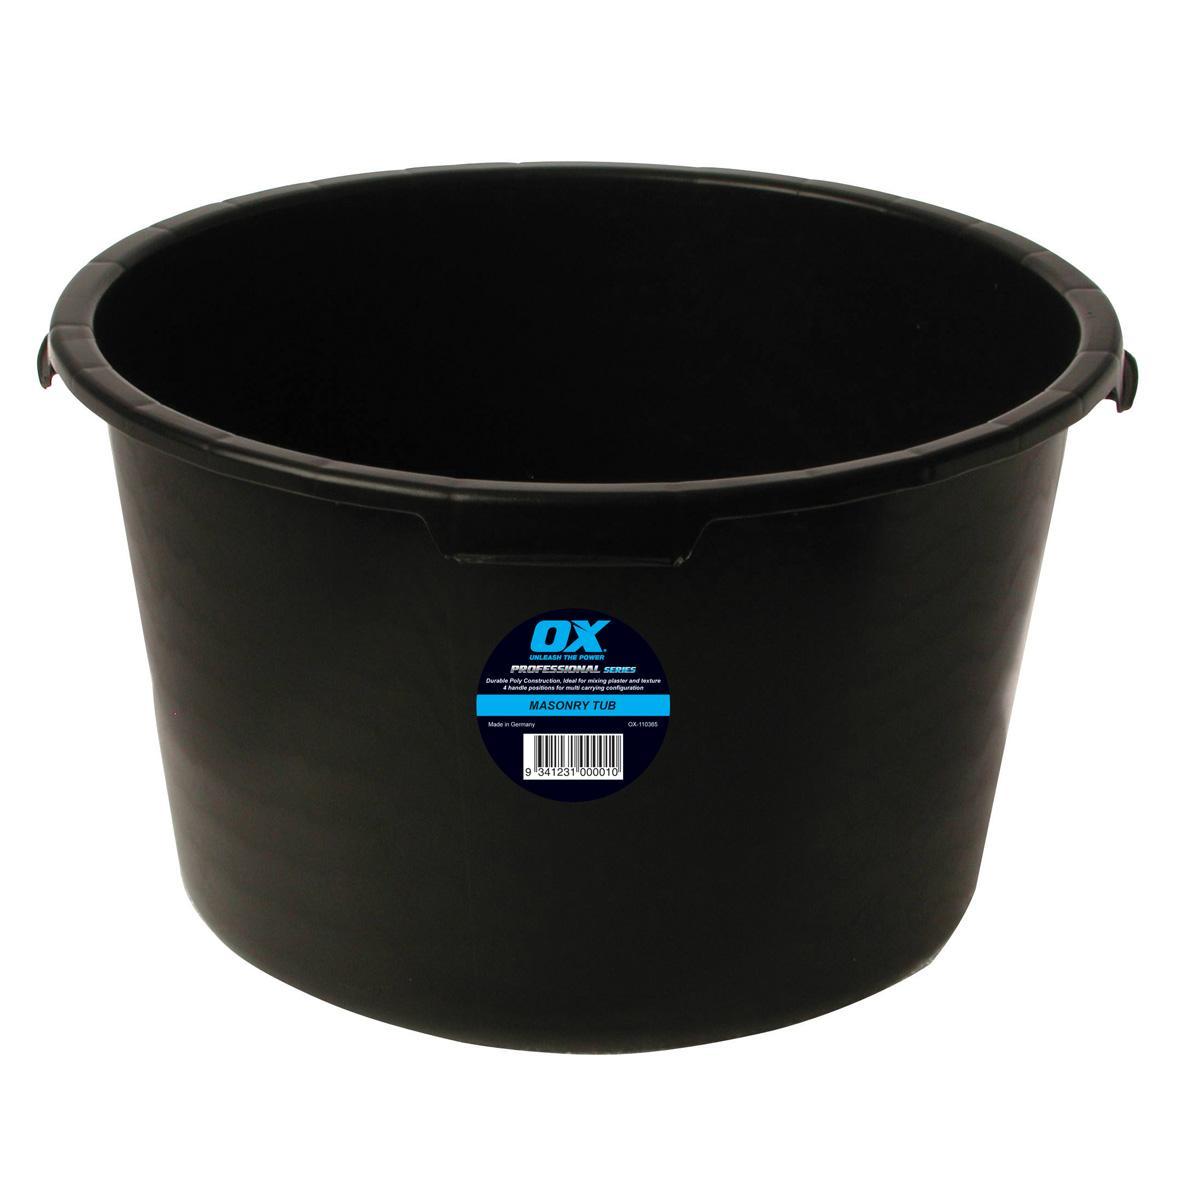 OX Prof Masonary Tub 90Ltr